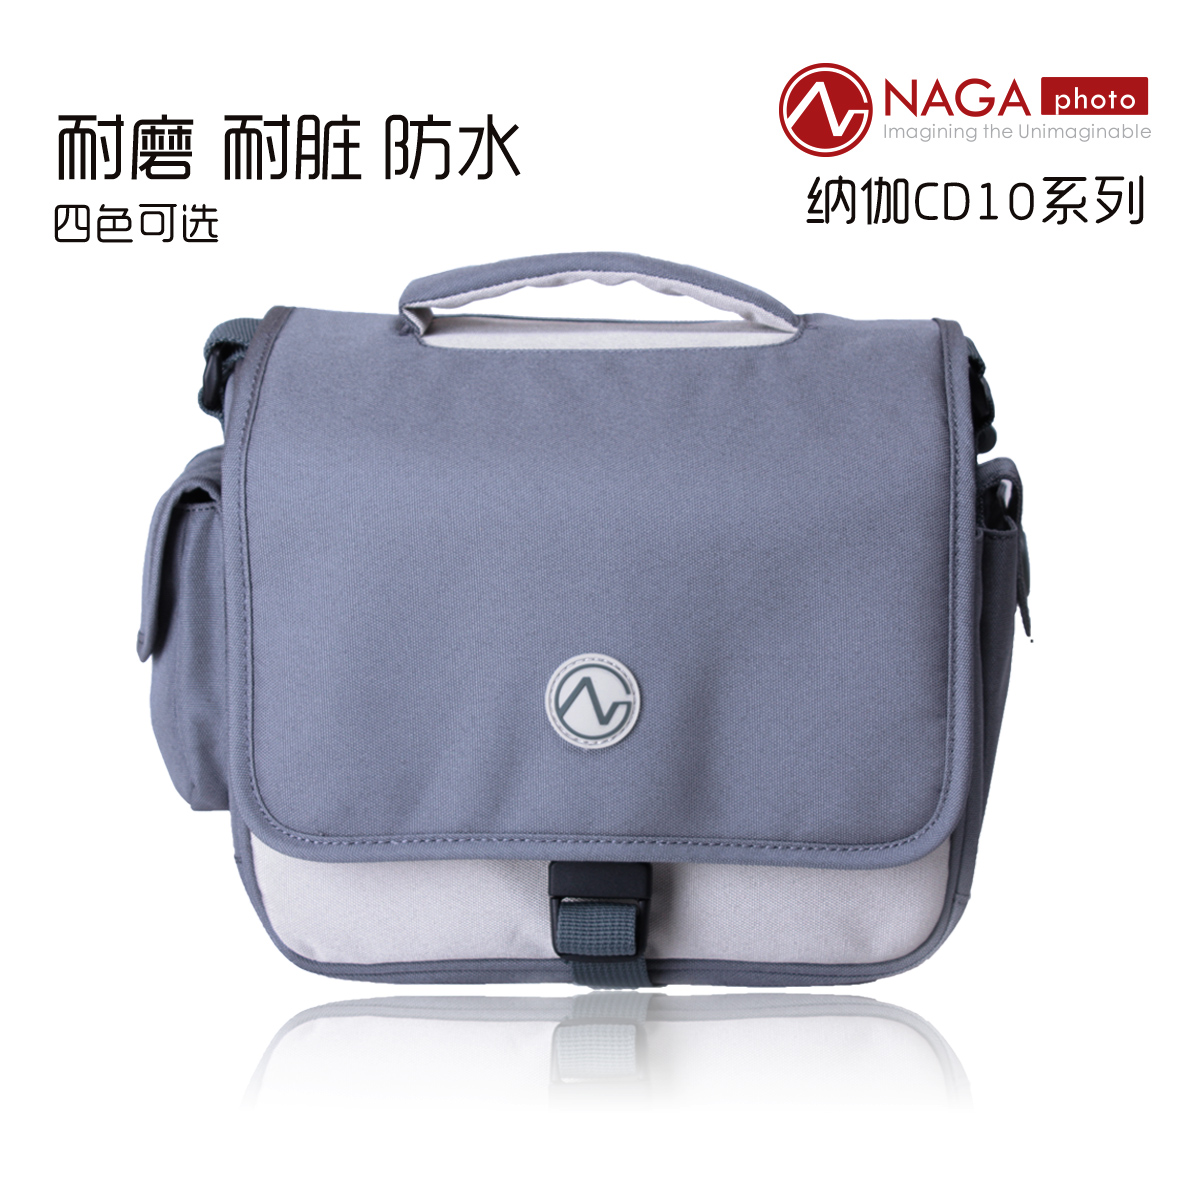 Нано гамма baodan плечо камеры мешок SLR камеры SLR Canon Sony сумка микро камеры Nikon камеры сумки женщин